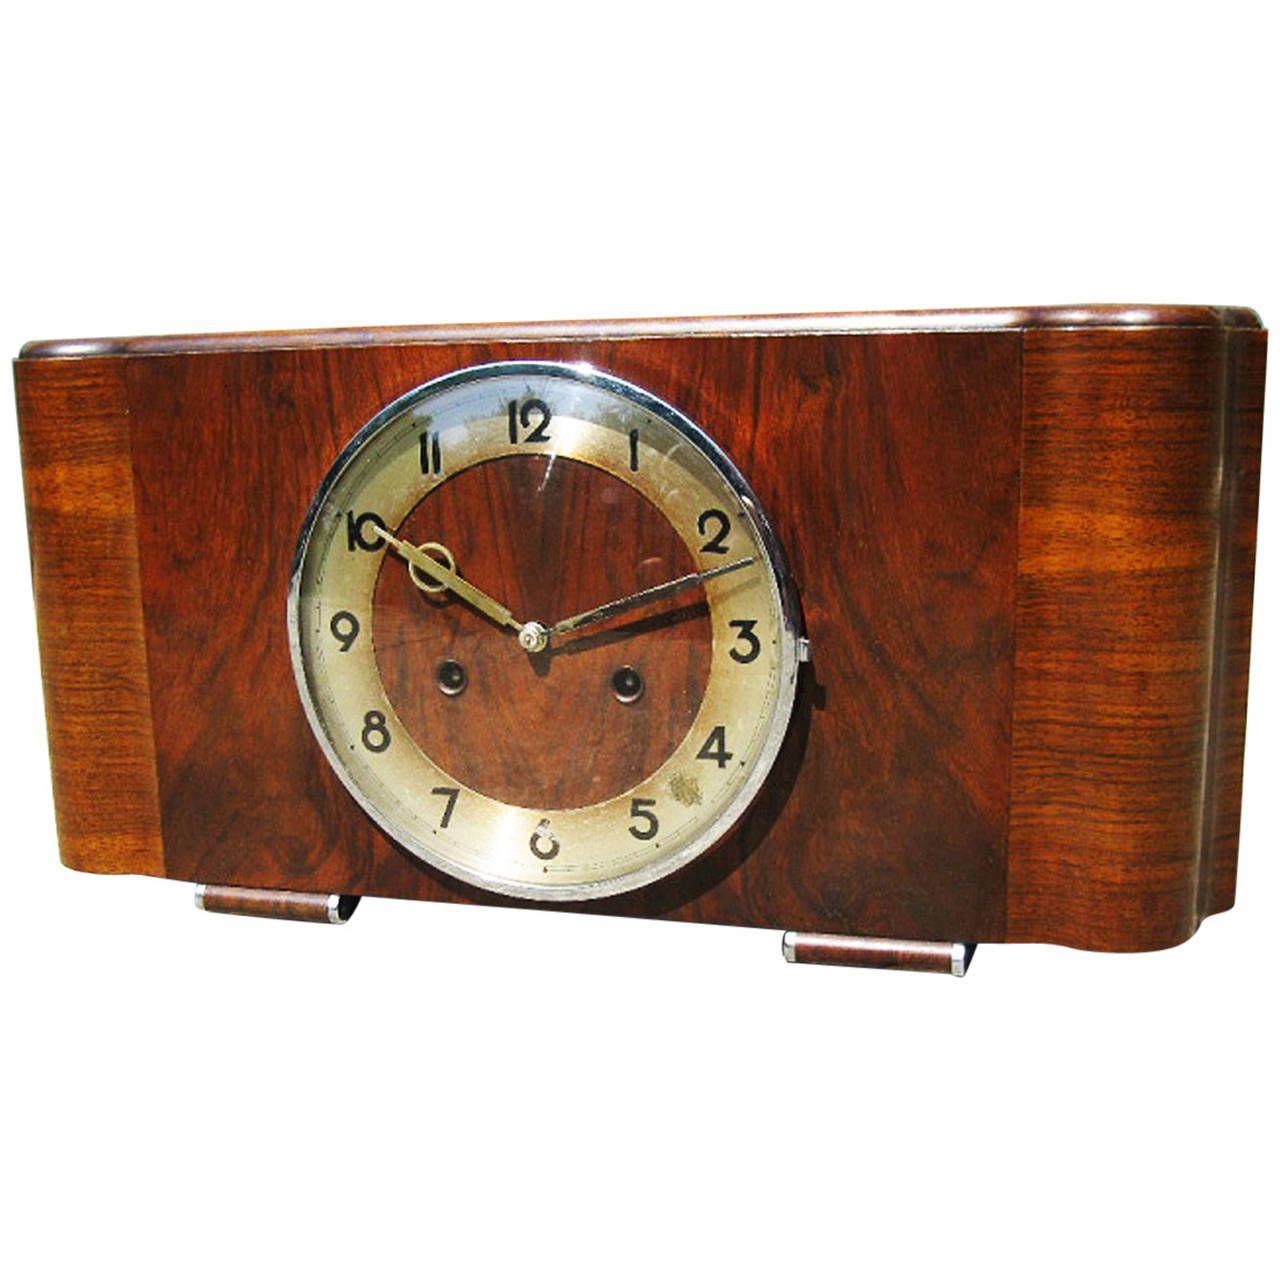 Celebrating Biba The Deco Haus: Mantel Clocks, Art Deco And Clocks